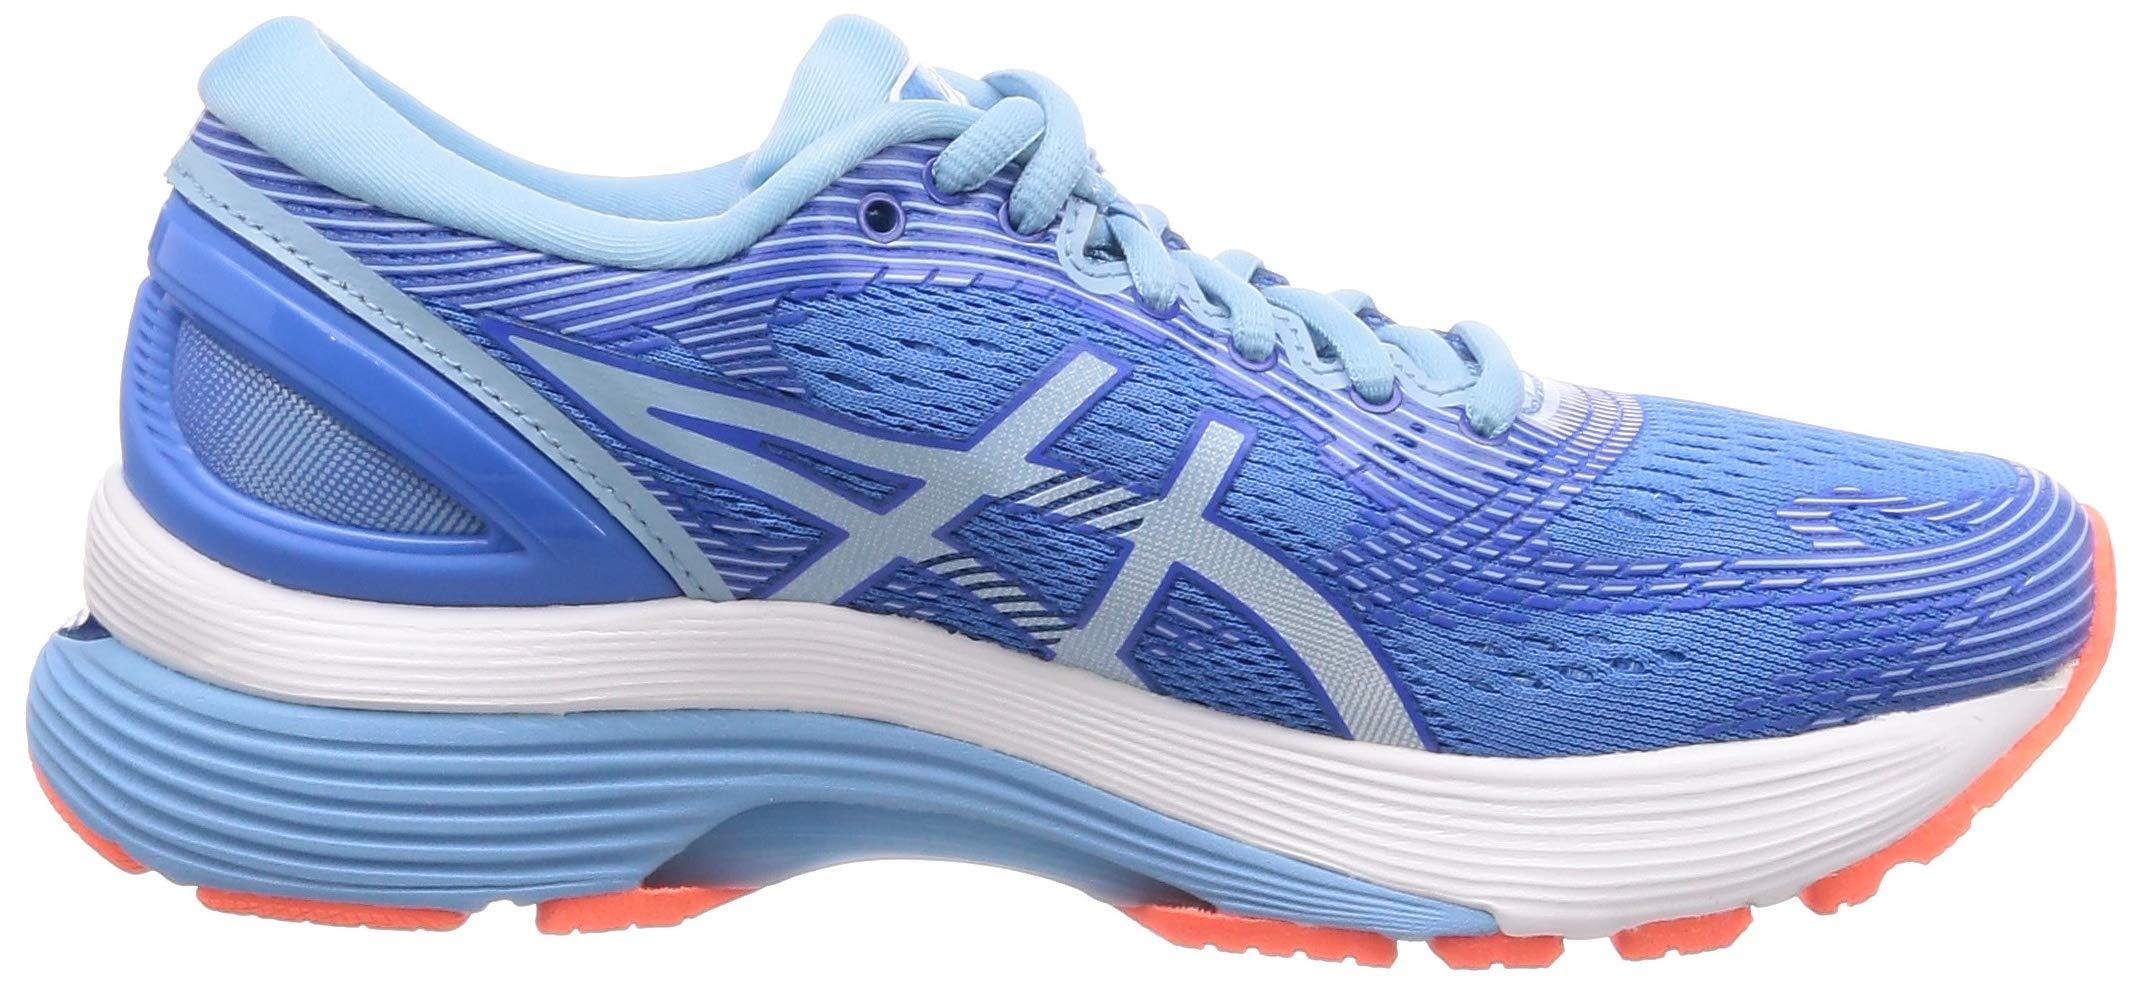 71jKHfczO L - ASICS Women's Gel-Nimbus 21 Running Shoes